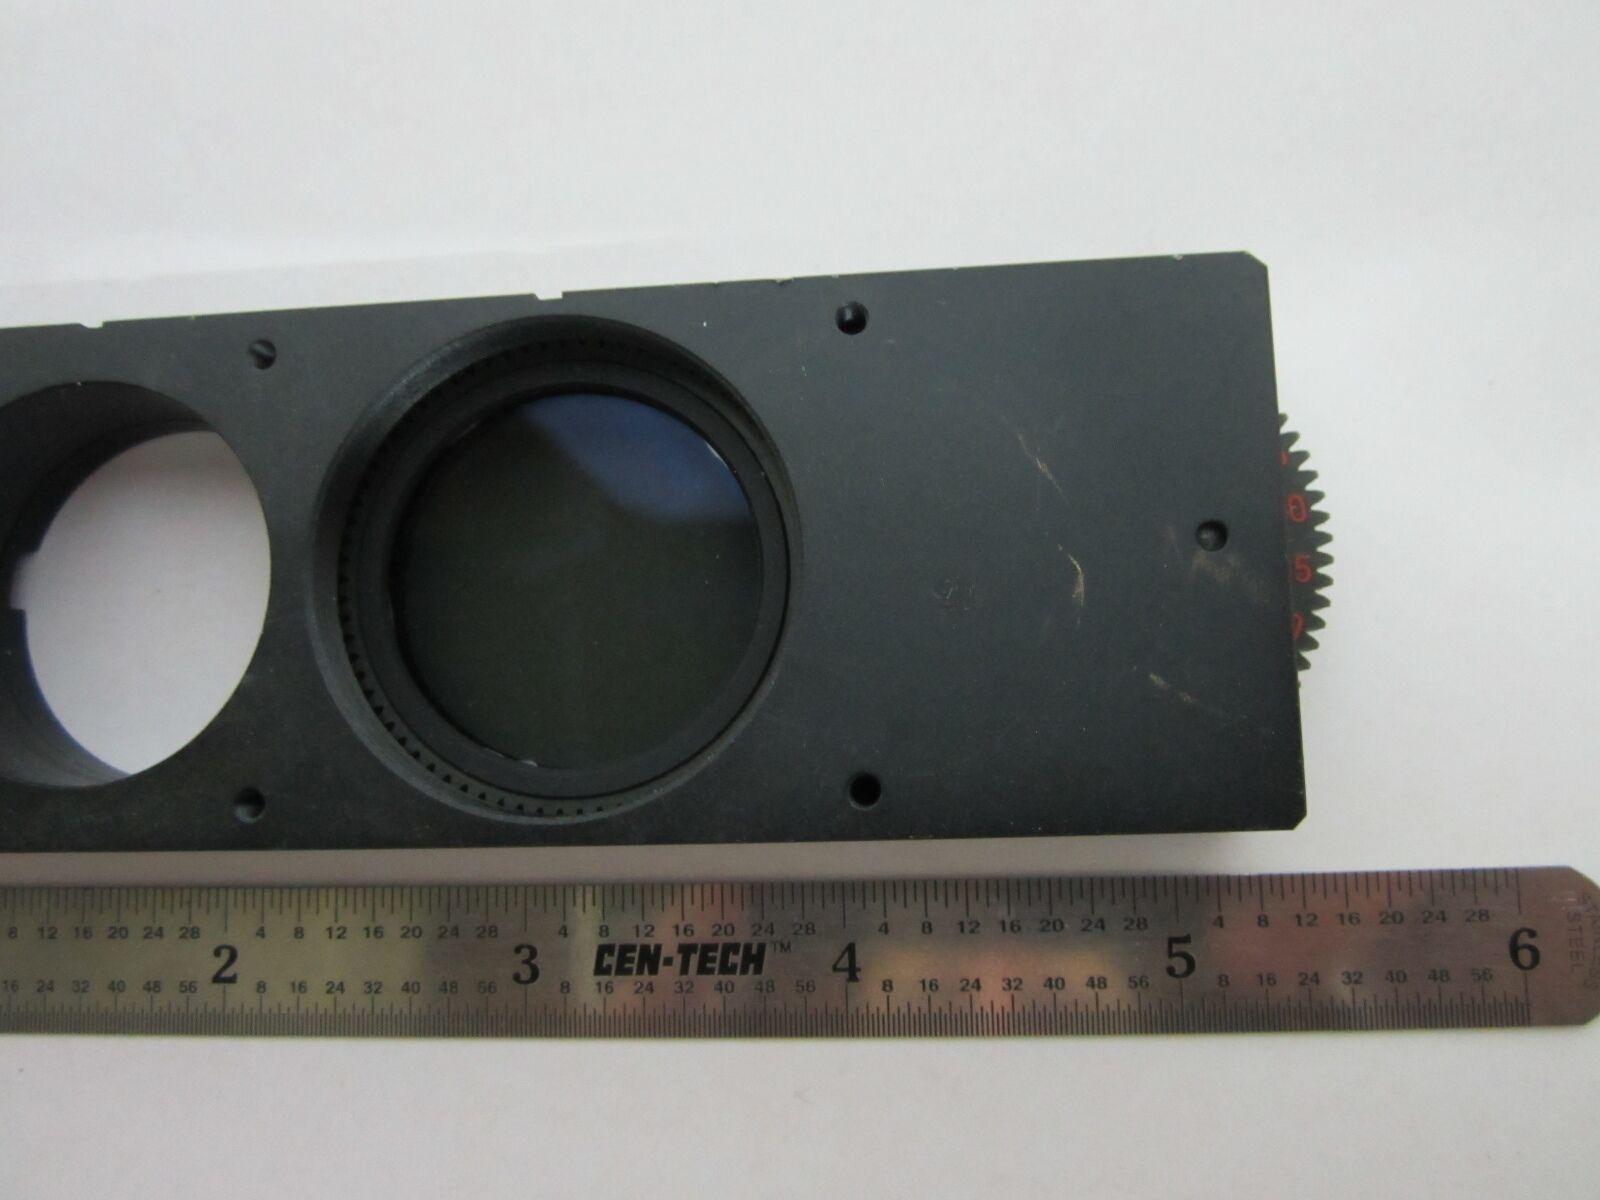 Microscopio Parte Polarizador Slide Alemania Alemania Slide 513650 Óptica Papelera B1-R-11 14de0b